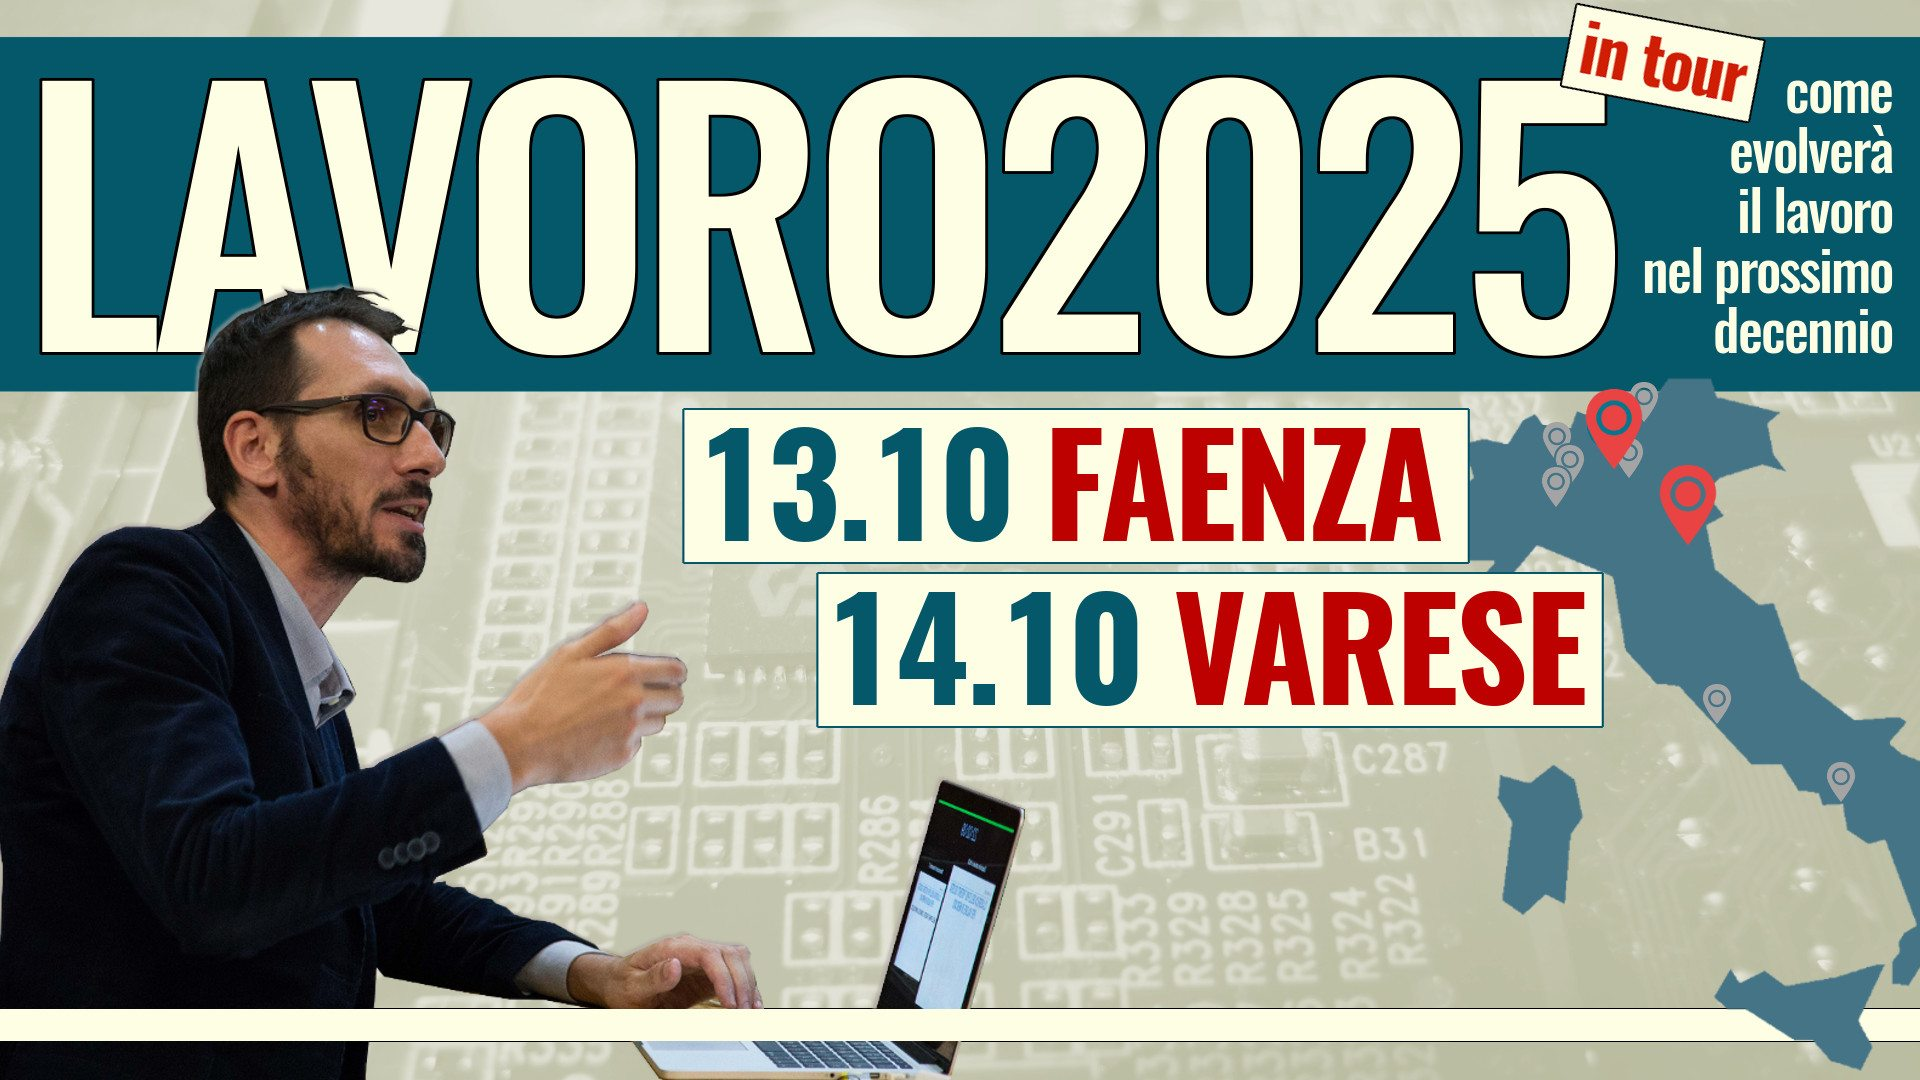 #Lavoro2025Tour: Faenza (RA) e Varese chiudono il terzo ciclo